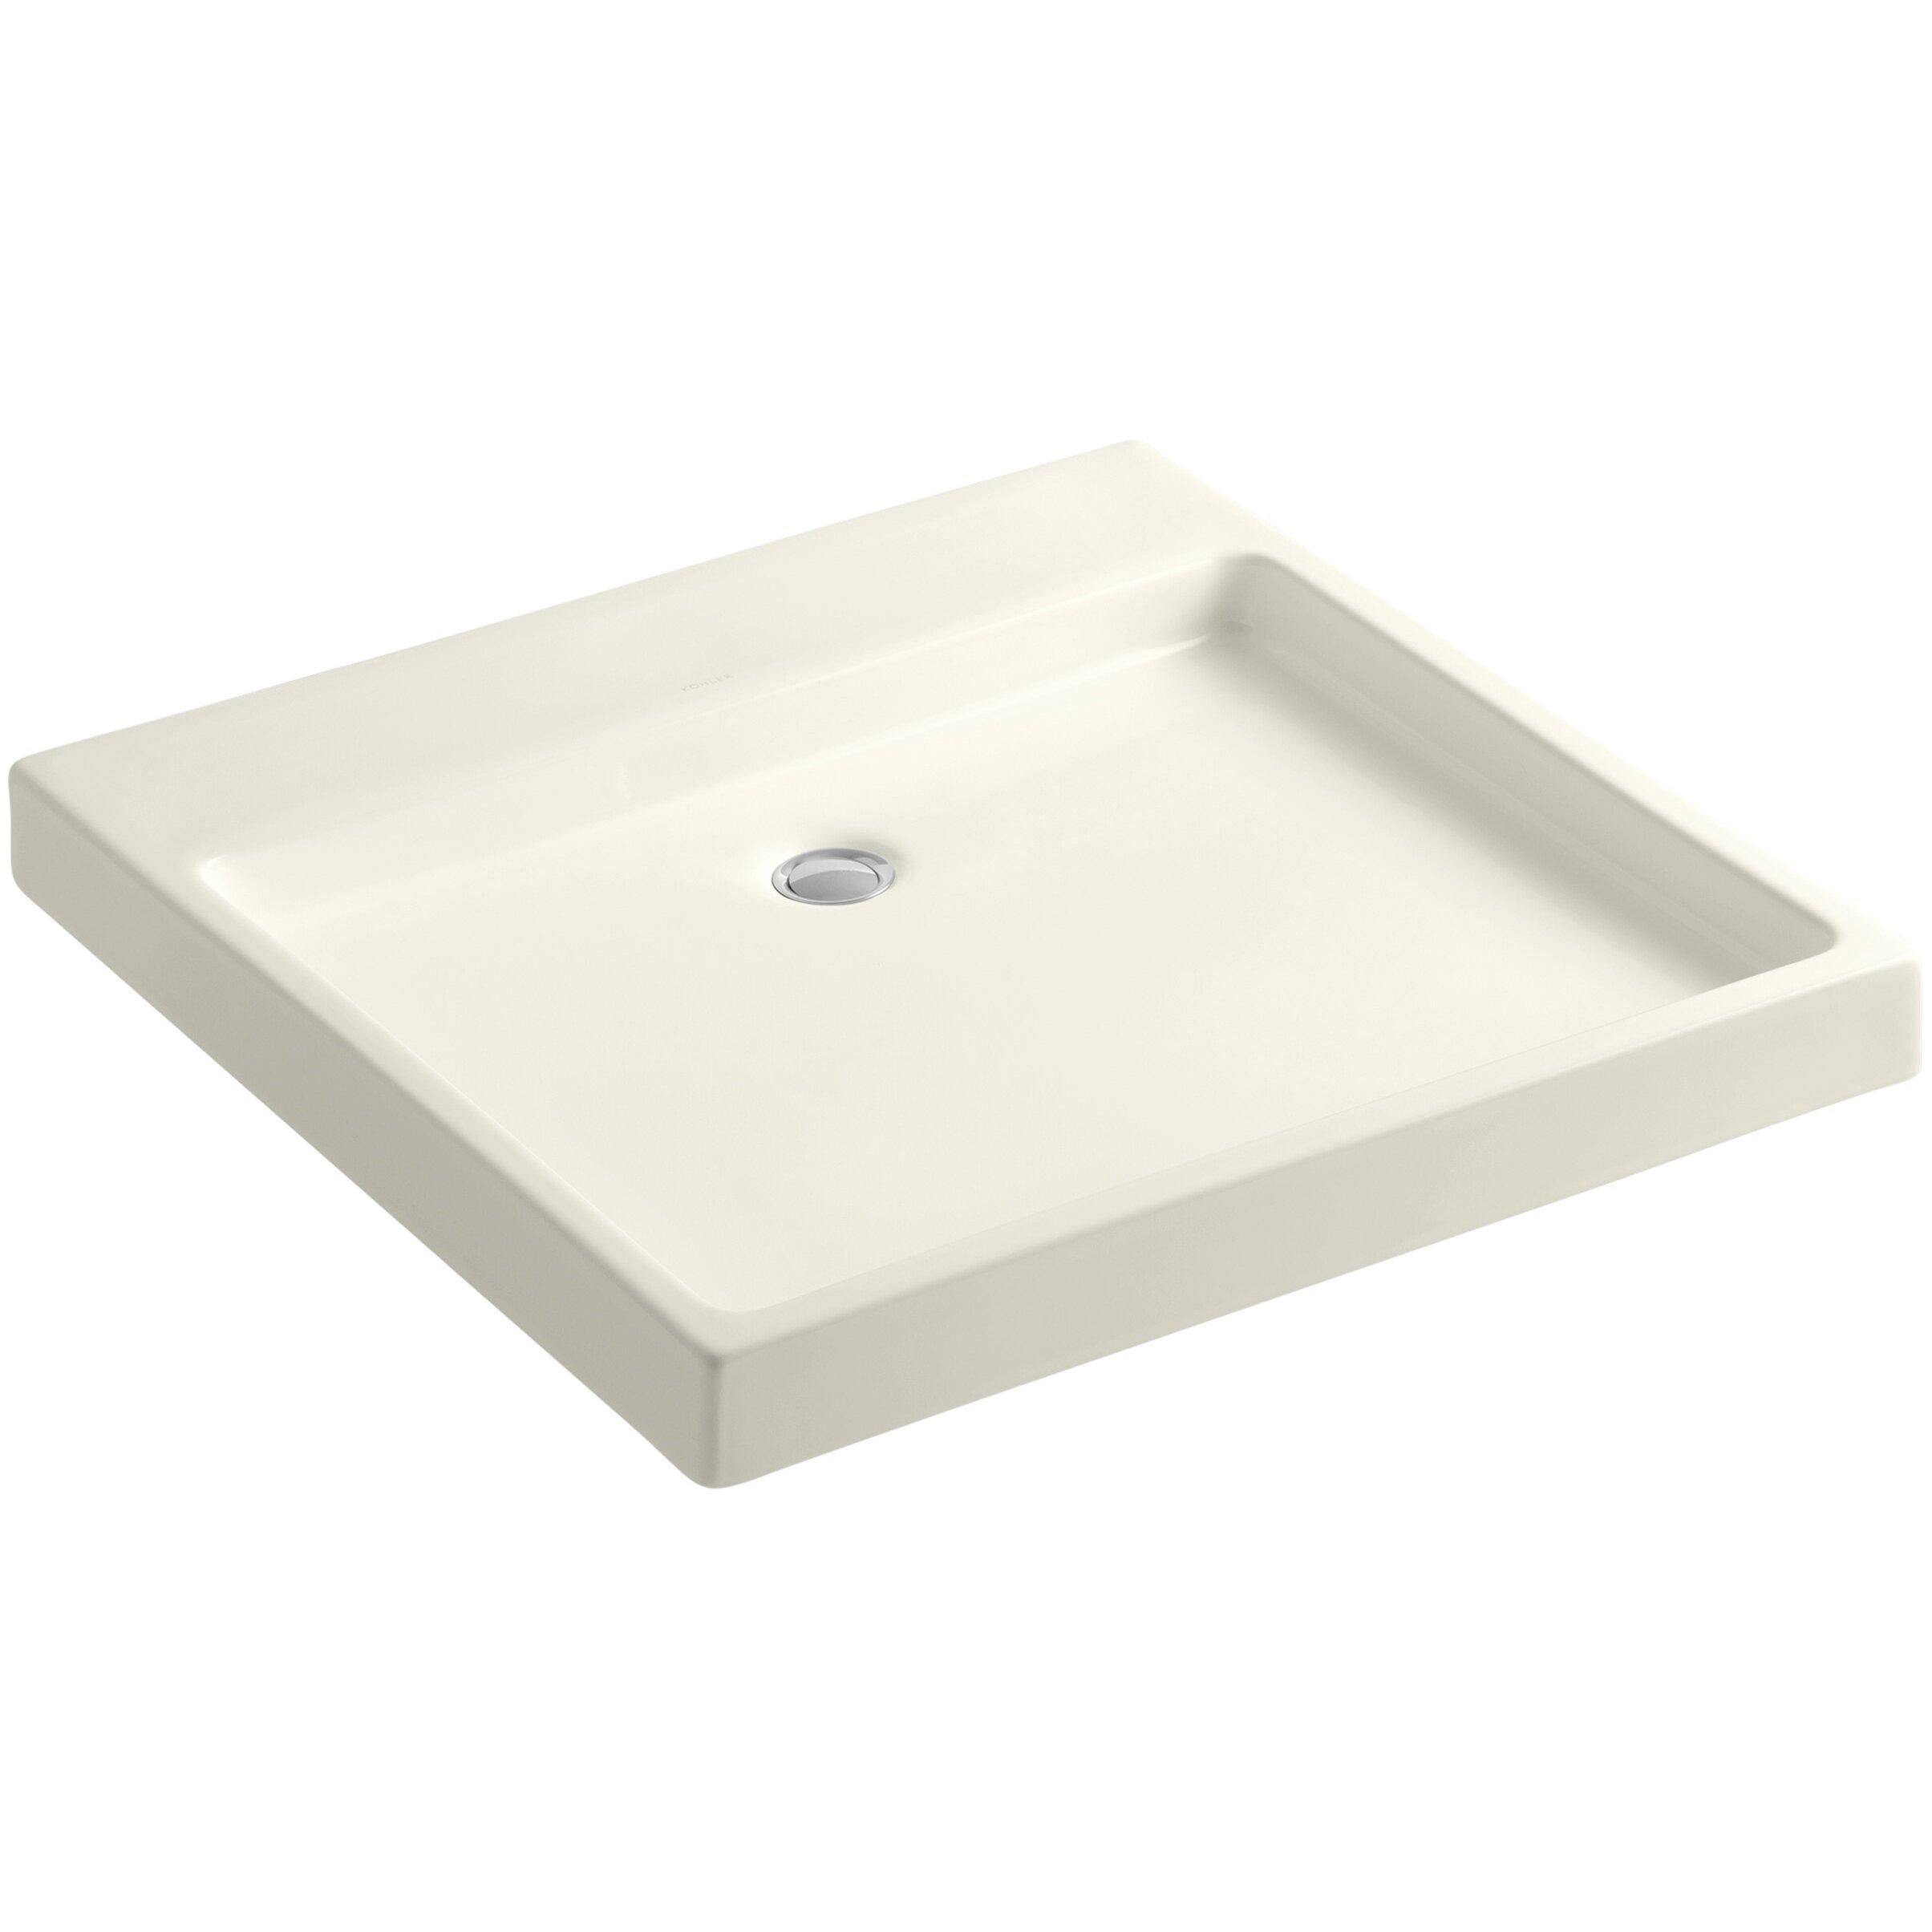 Kohler Wall Mount Sink : Kohler Purist Wading Pool Above-Counter/Wall-Mount Bathroom Sink ...